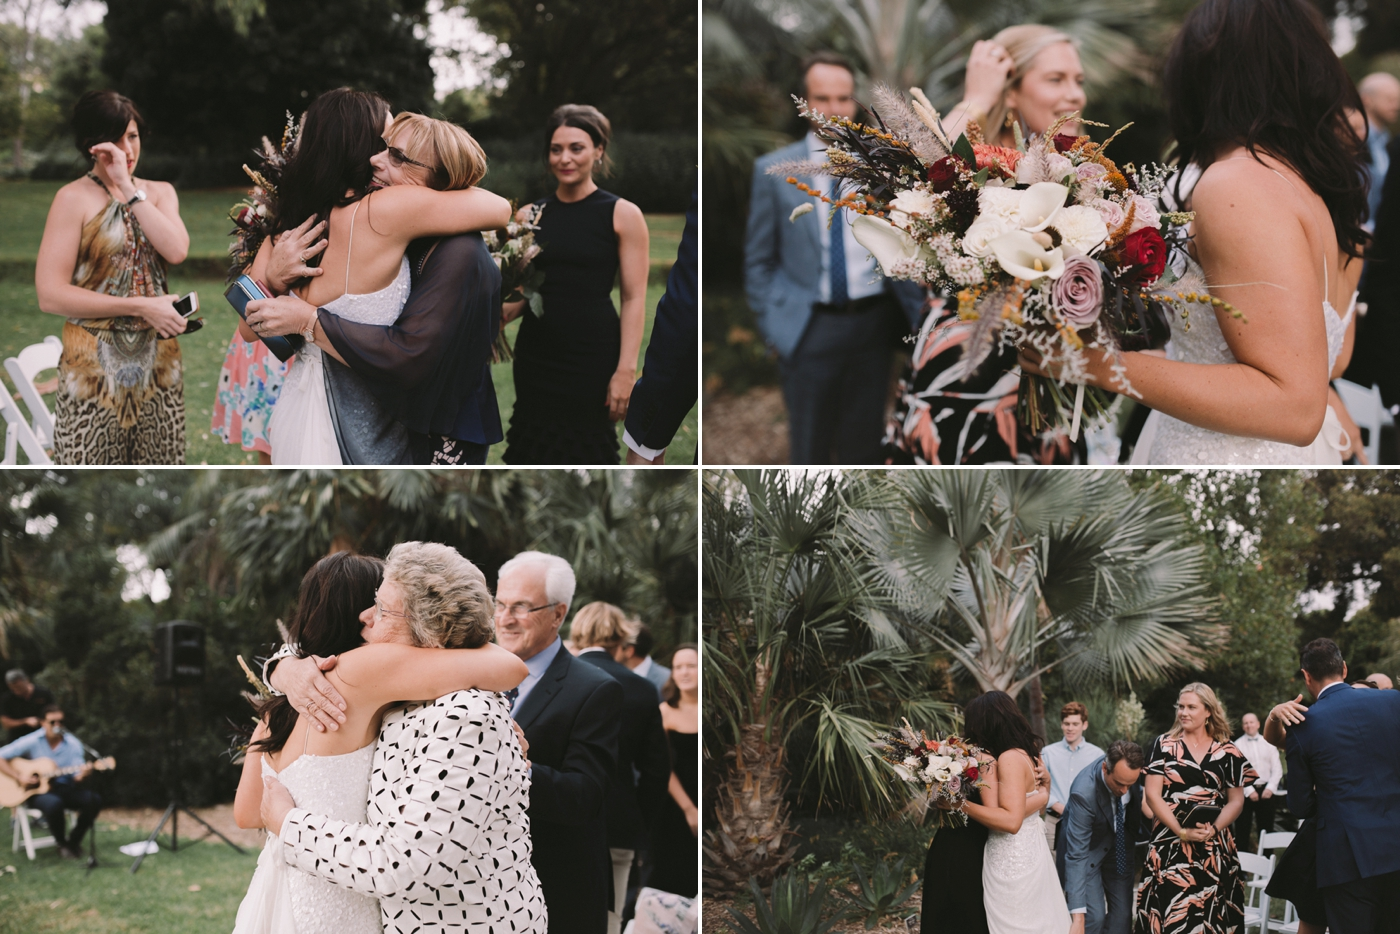 Kellie & Brent - Adelaide City Wedding - Natural wedding photography in Adelaide - Katherine Schultz - www.katherineschultzphotography.com 49